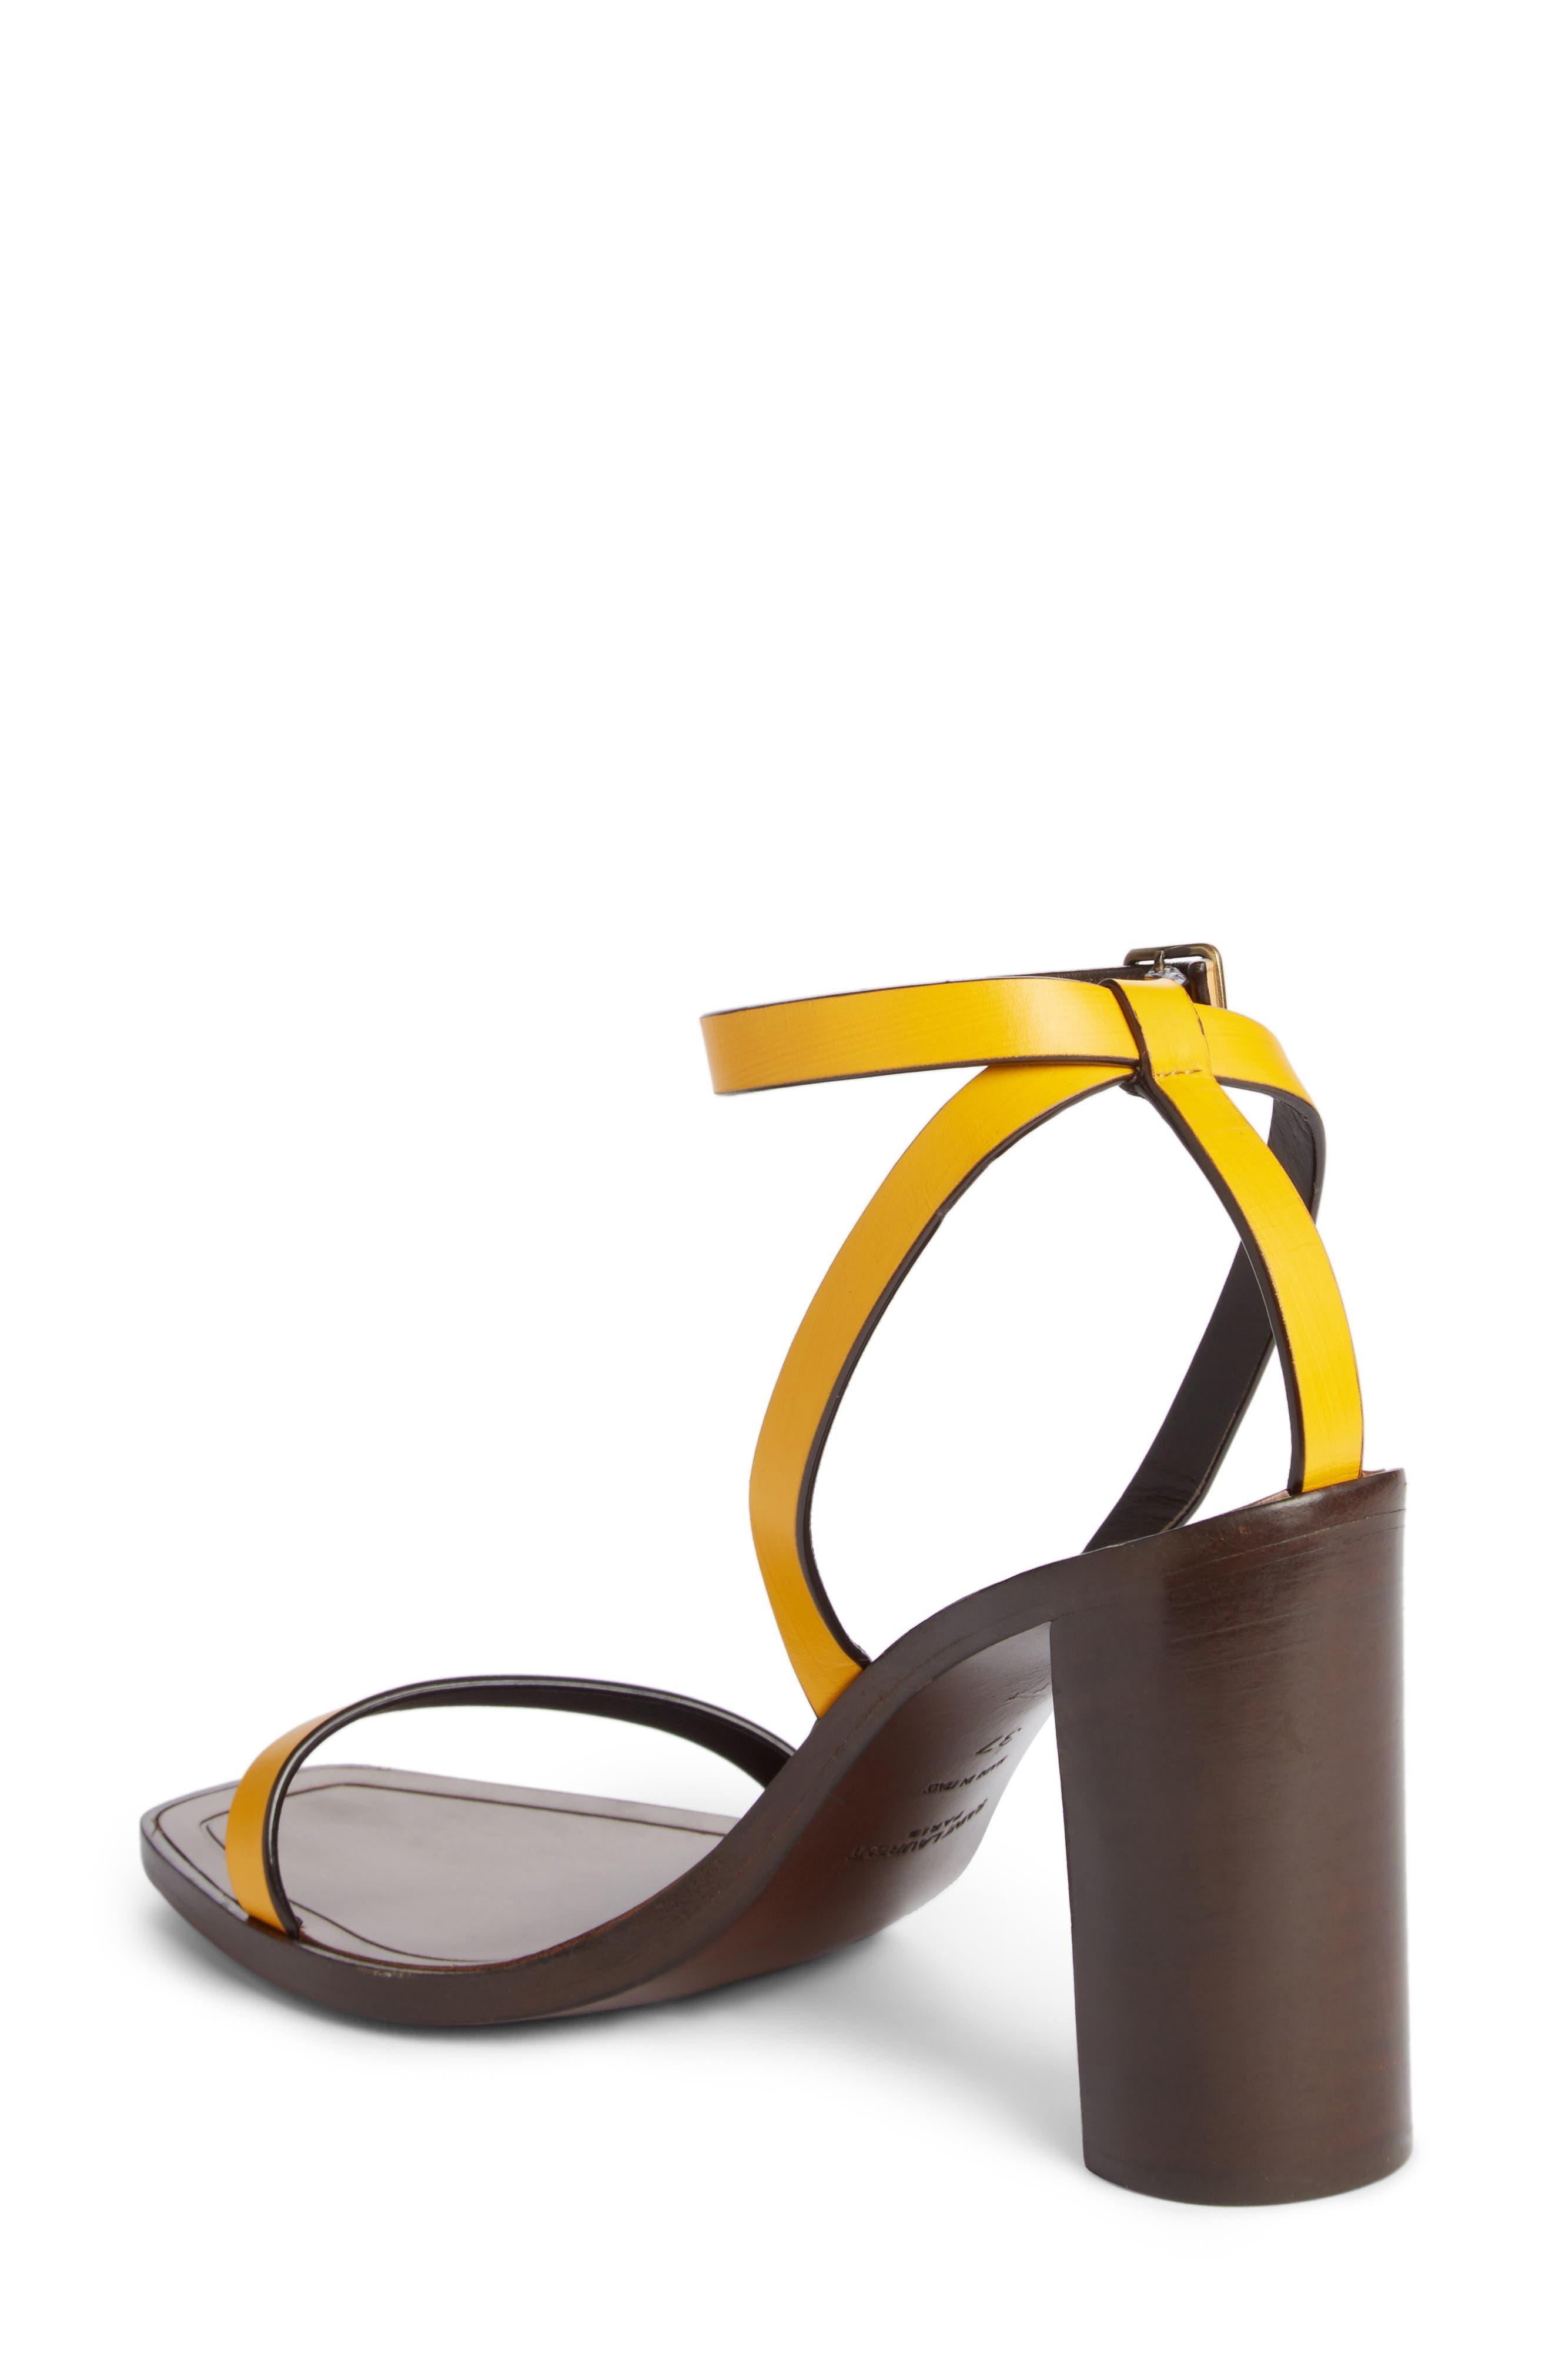 Loulou Ankle Strap Sandal,                             Alternate thumbnail 2, color,                             Black/ Yellow